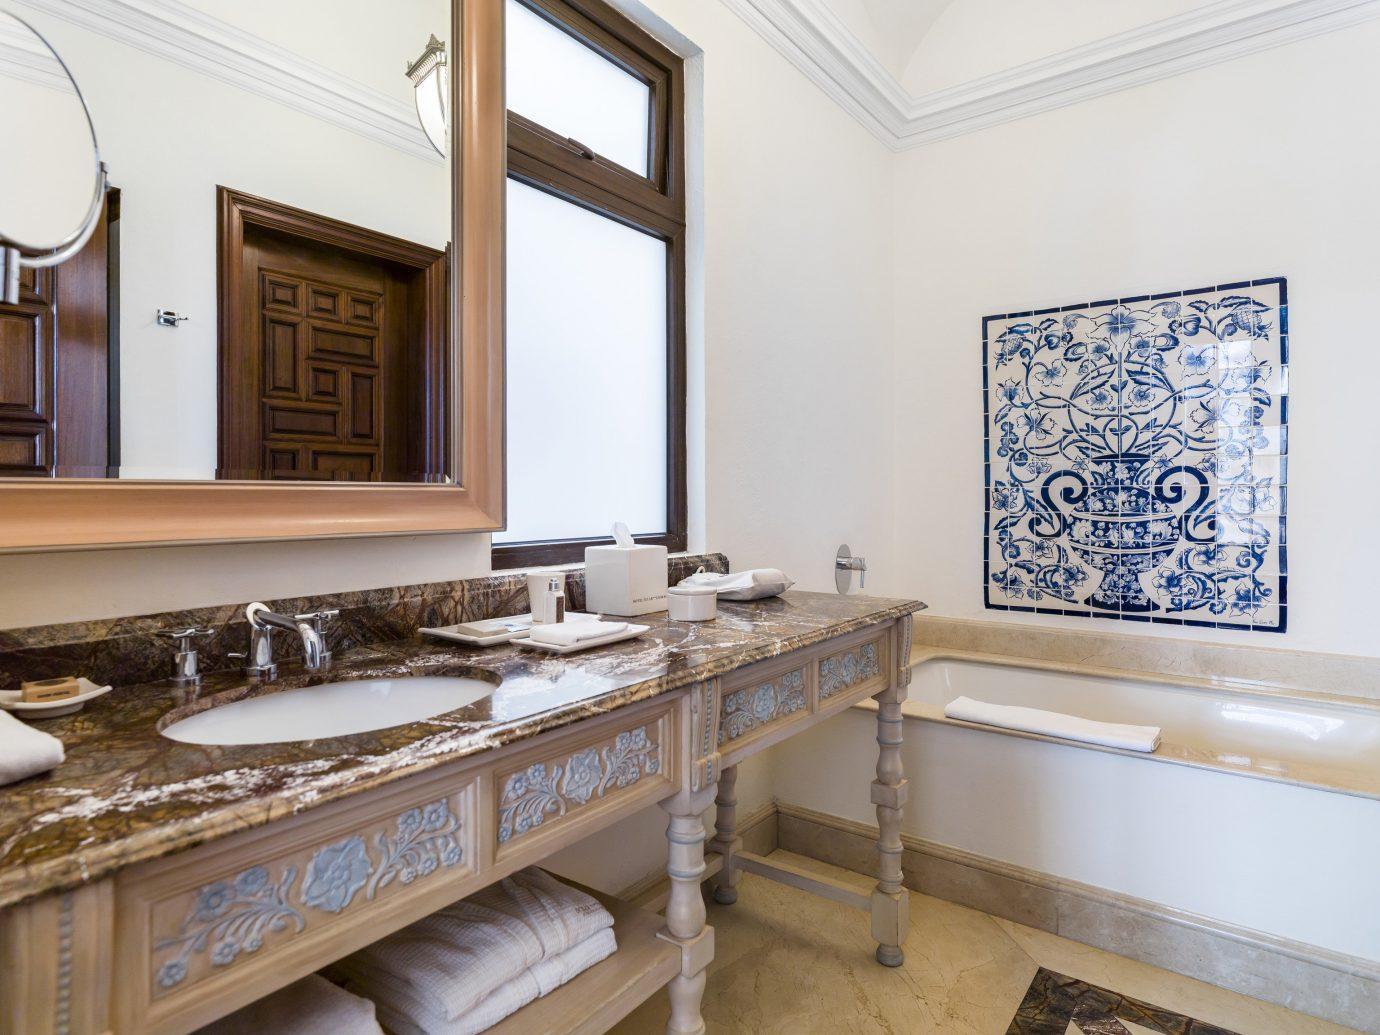 Trip Ideas indoor wall bathroom room floor sink window interior design real estate counter home estate wood